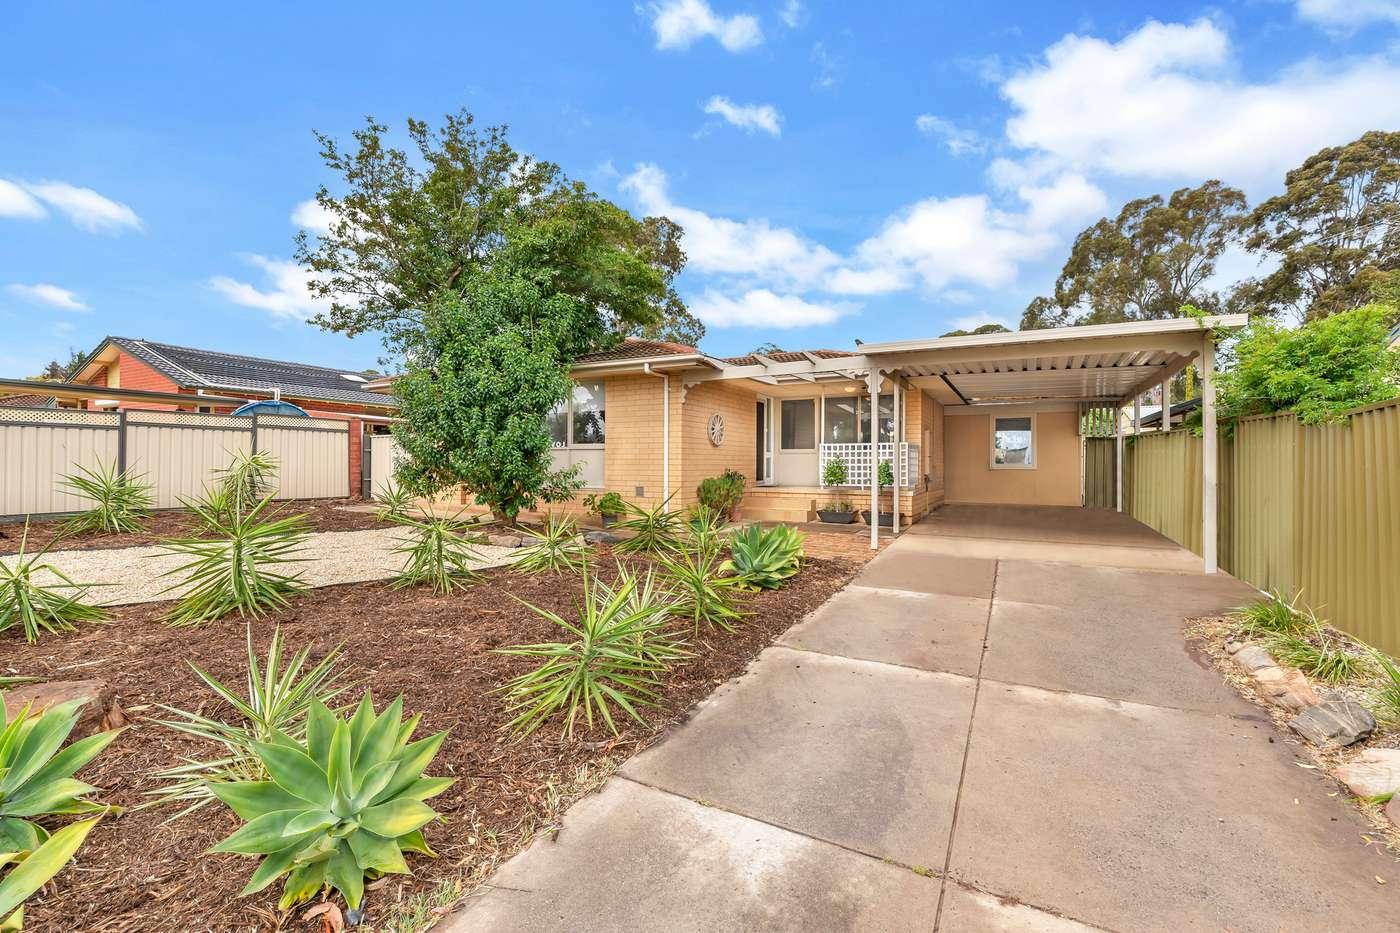 Main view of Homely house listing, 8 Vicki Avenue, Salisbury East, SA 5109